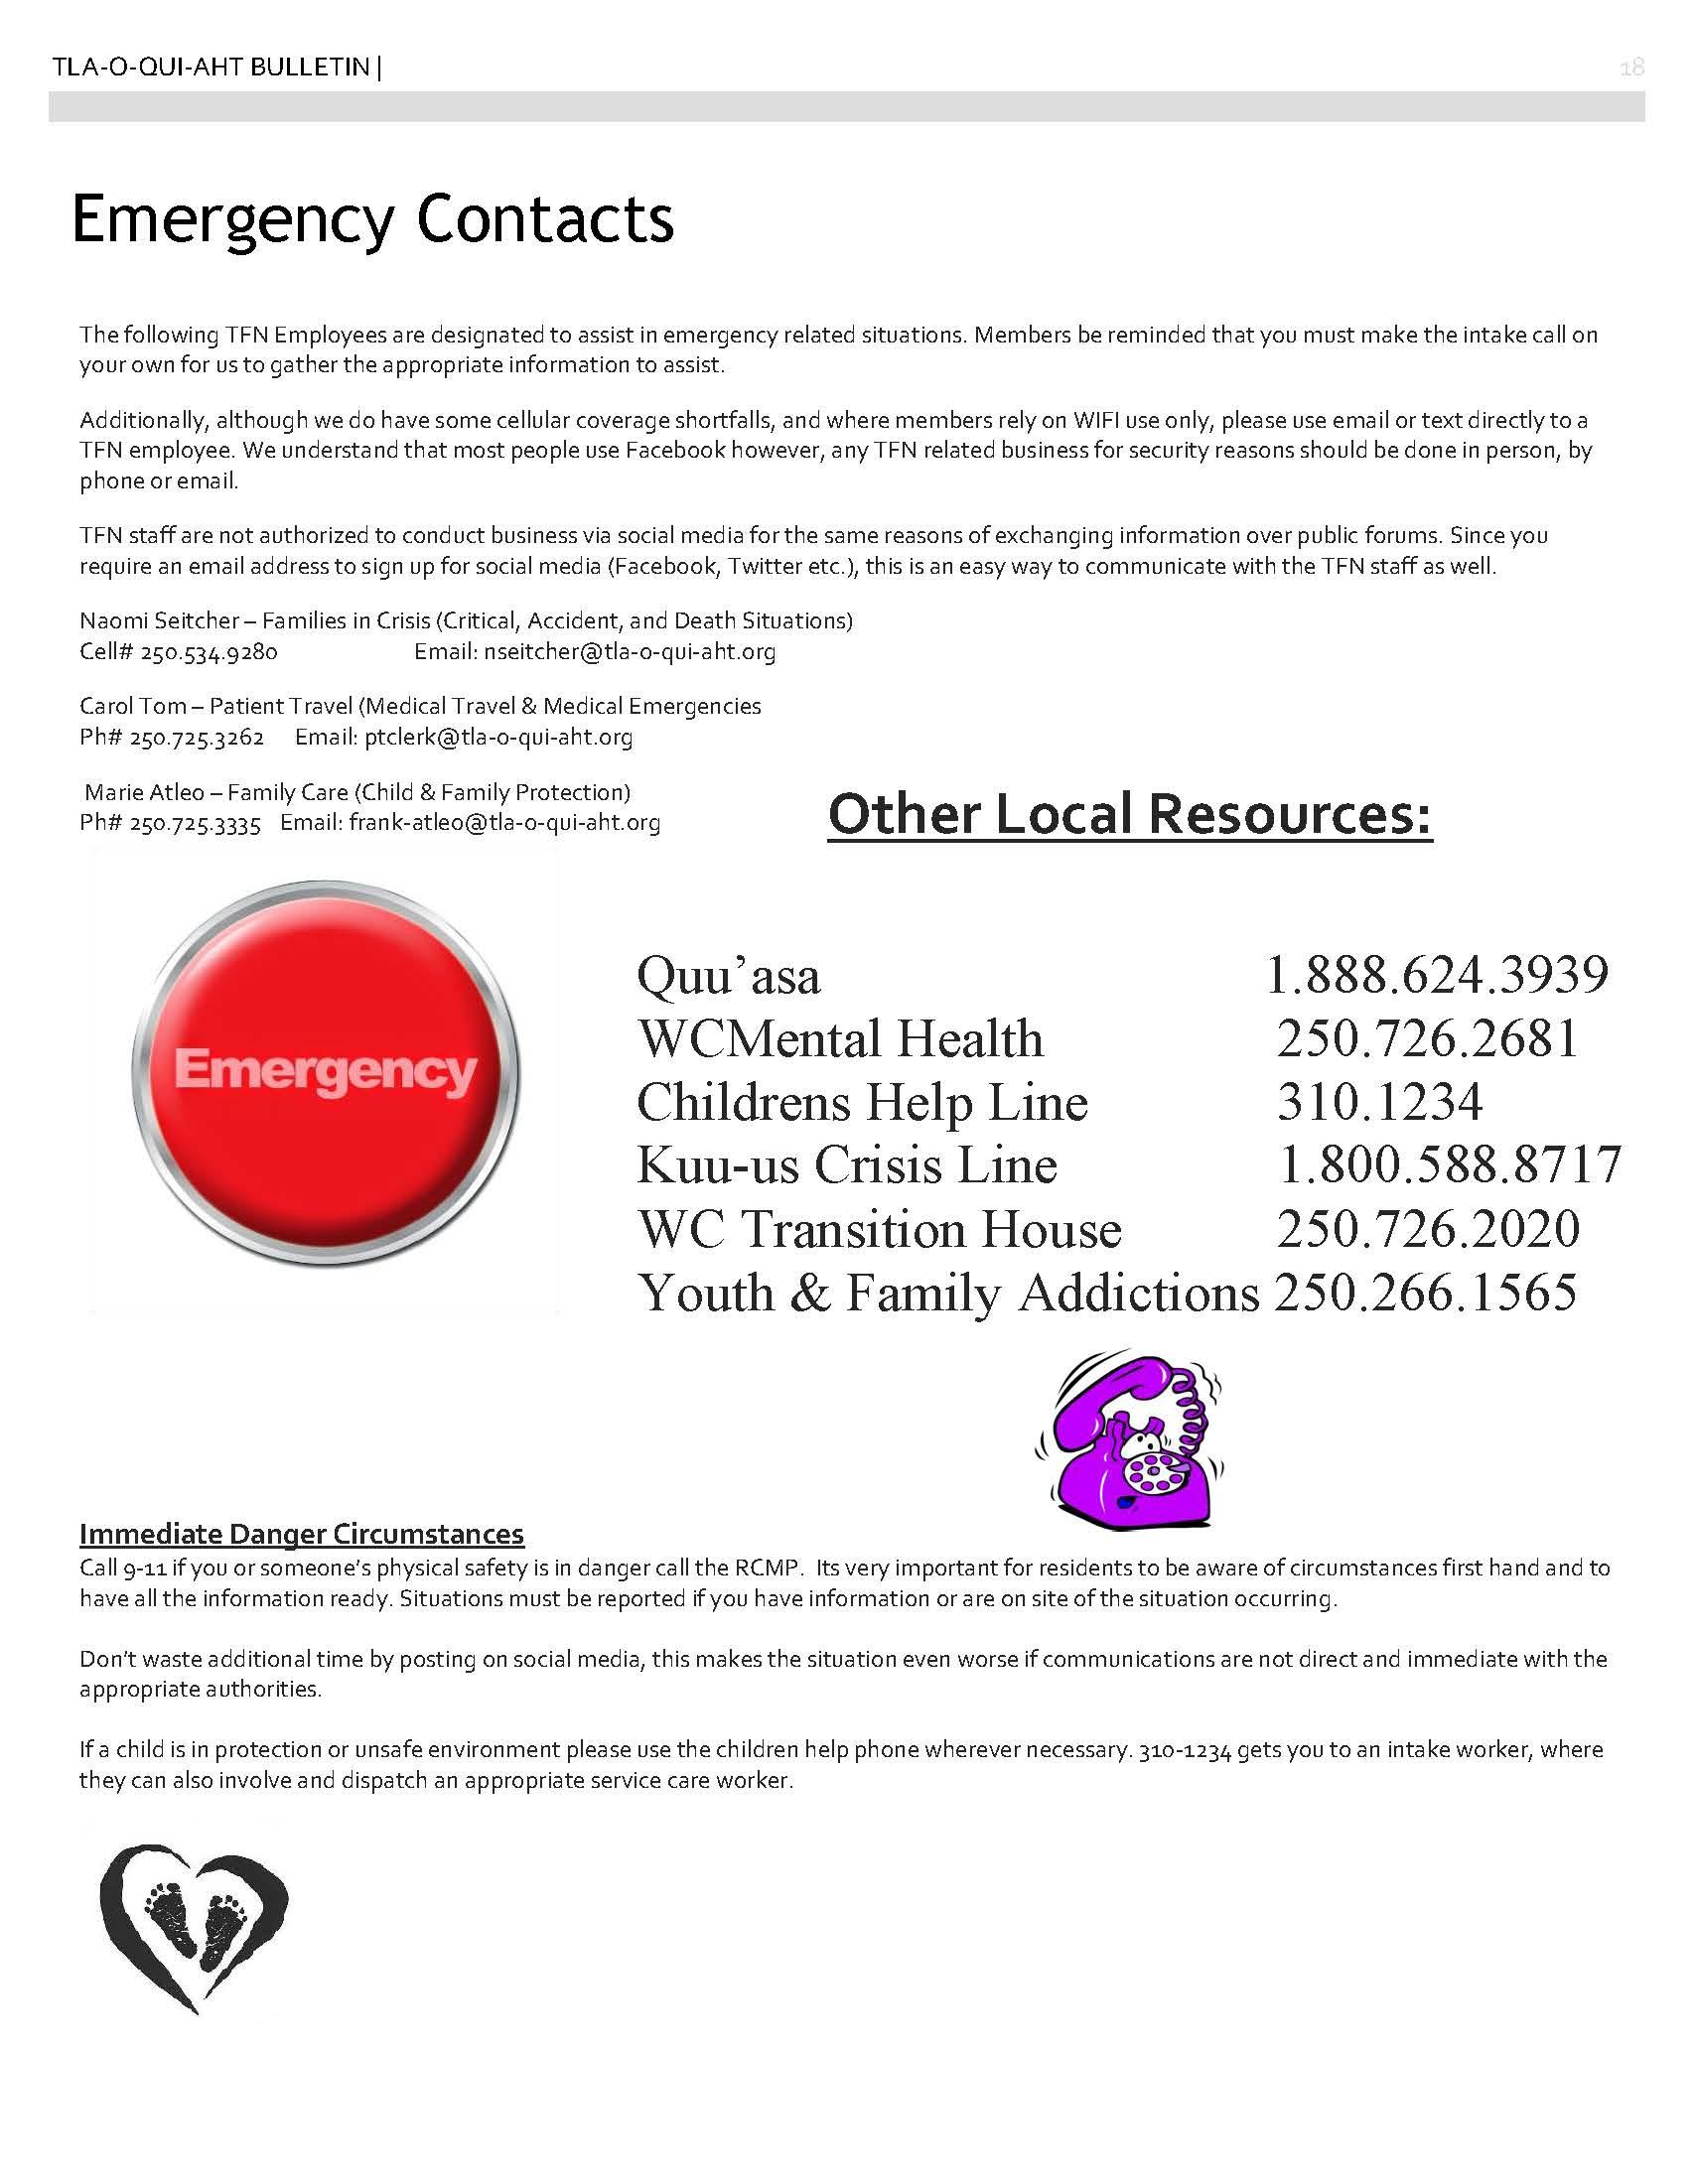 TFN Bulletin Sept 19-2016_Page_18.jpg